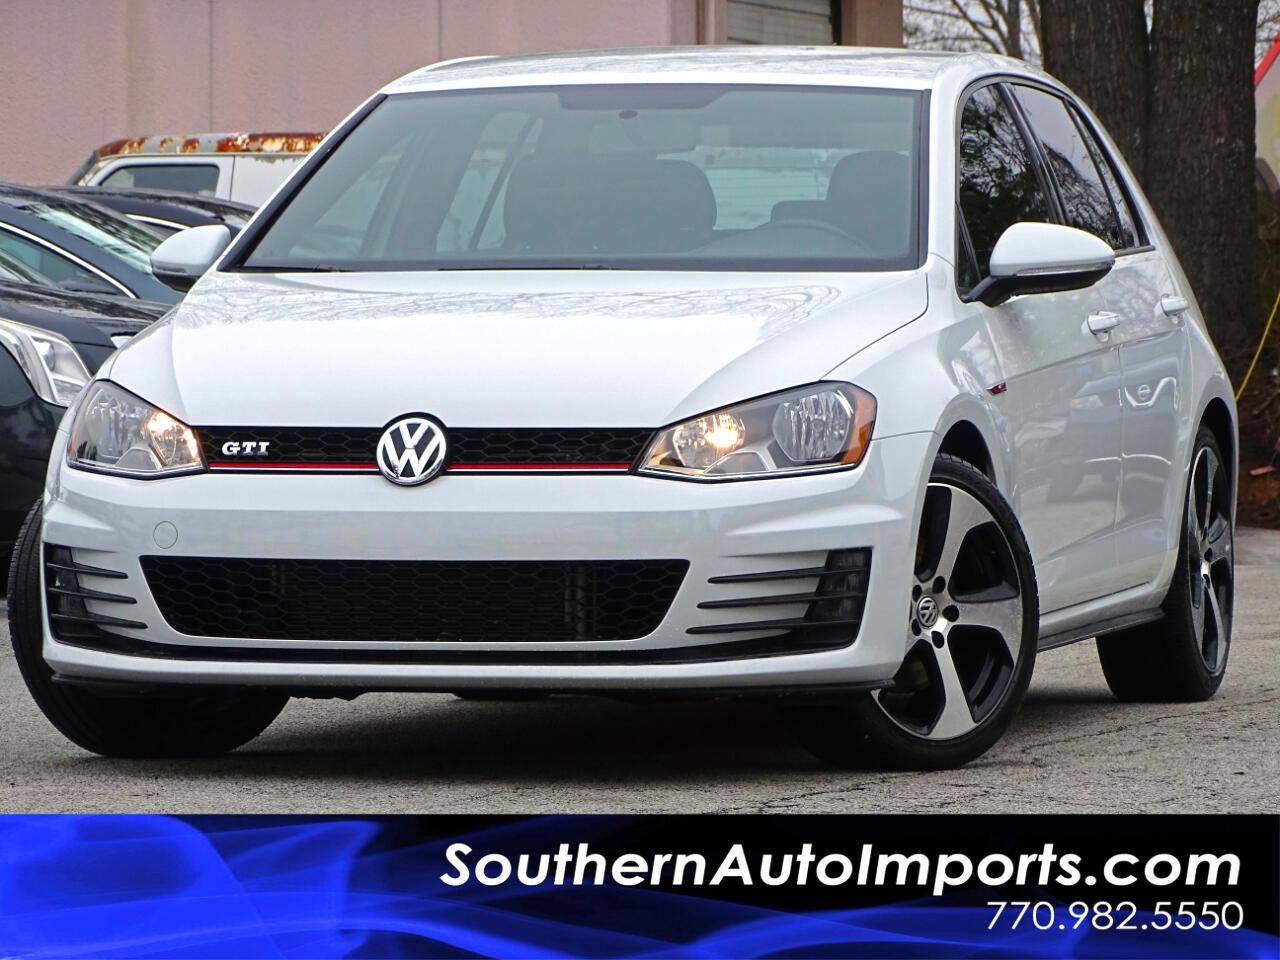 2016 Volkswagen Golf GTI S w/Back Up Camera Heated Seats